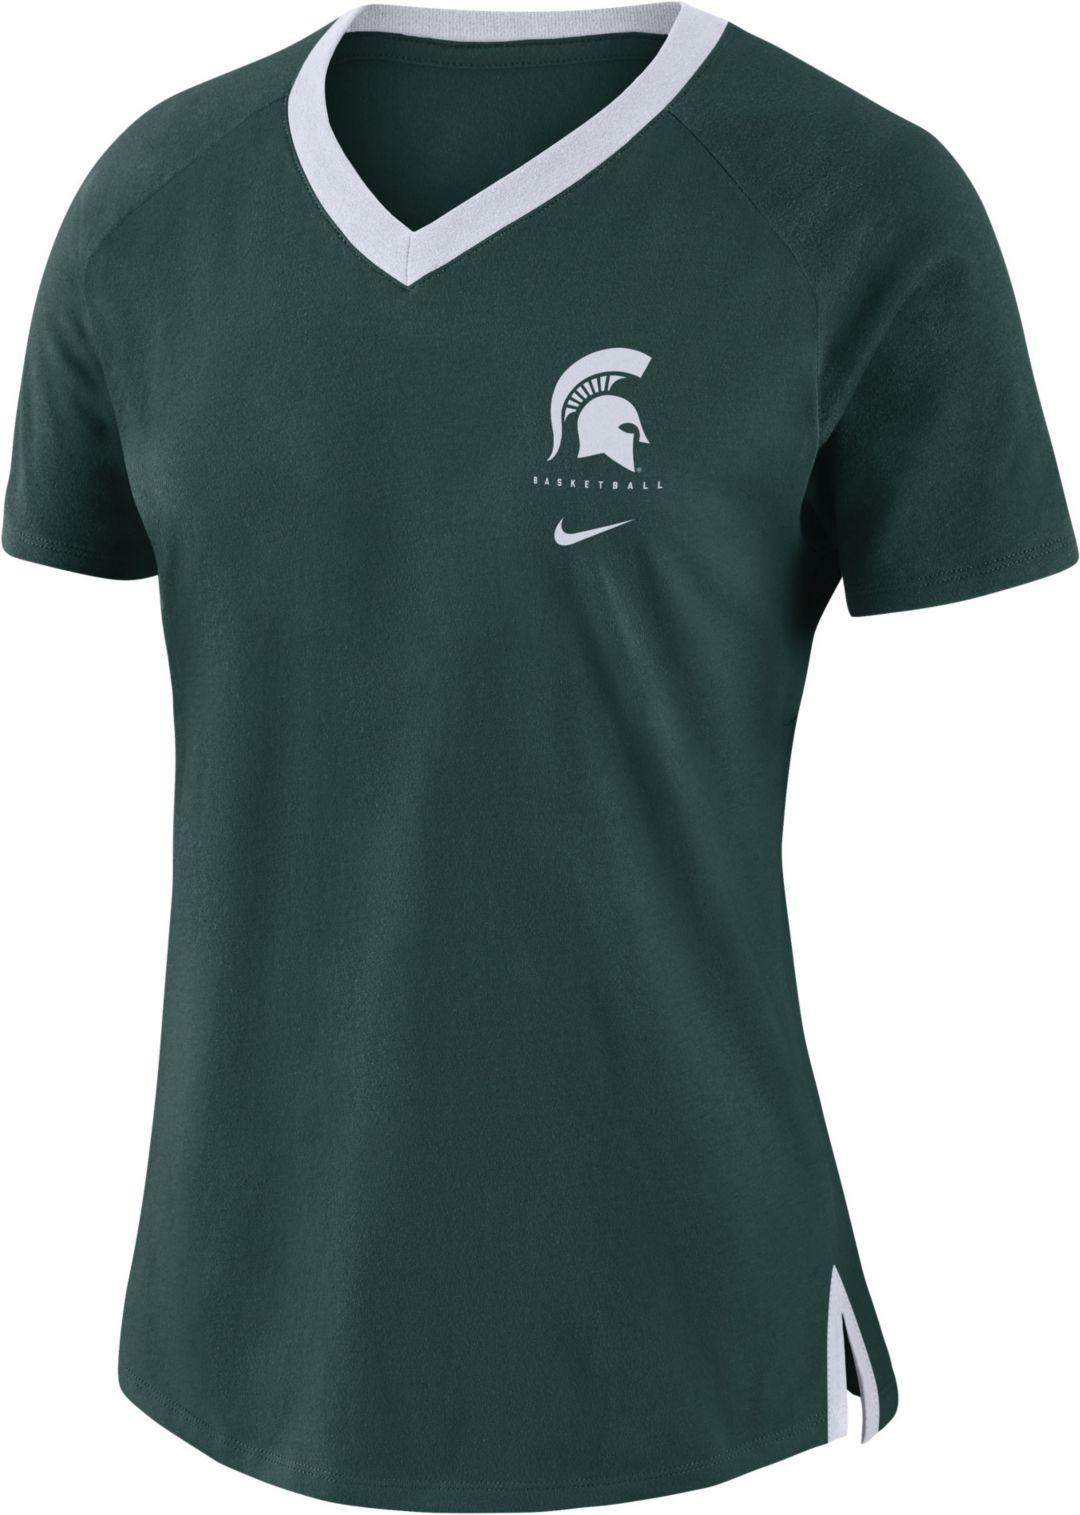 sale retailer ced96 b8629 Nike Women's Michigan State Spartans Green Tri-Blend Basketball Fan T-Shirt